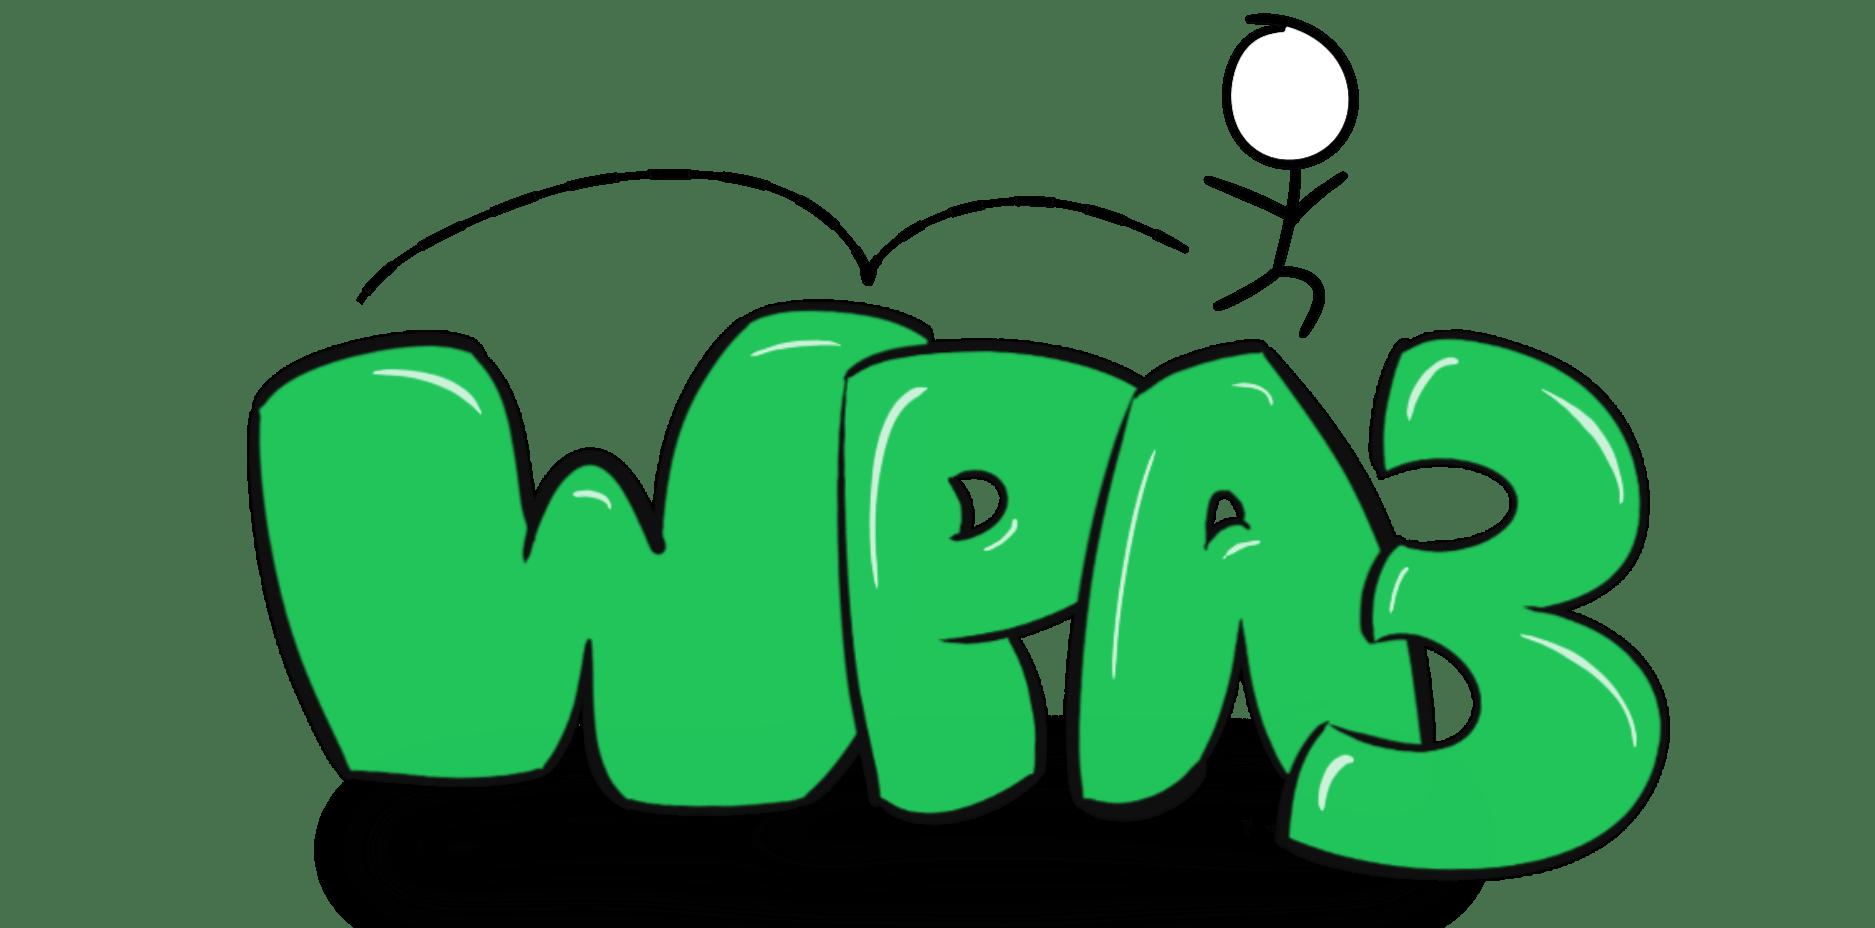 WPA3 illustration